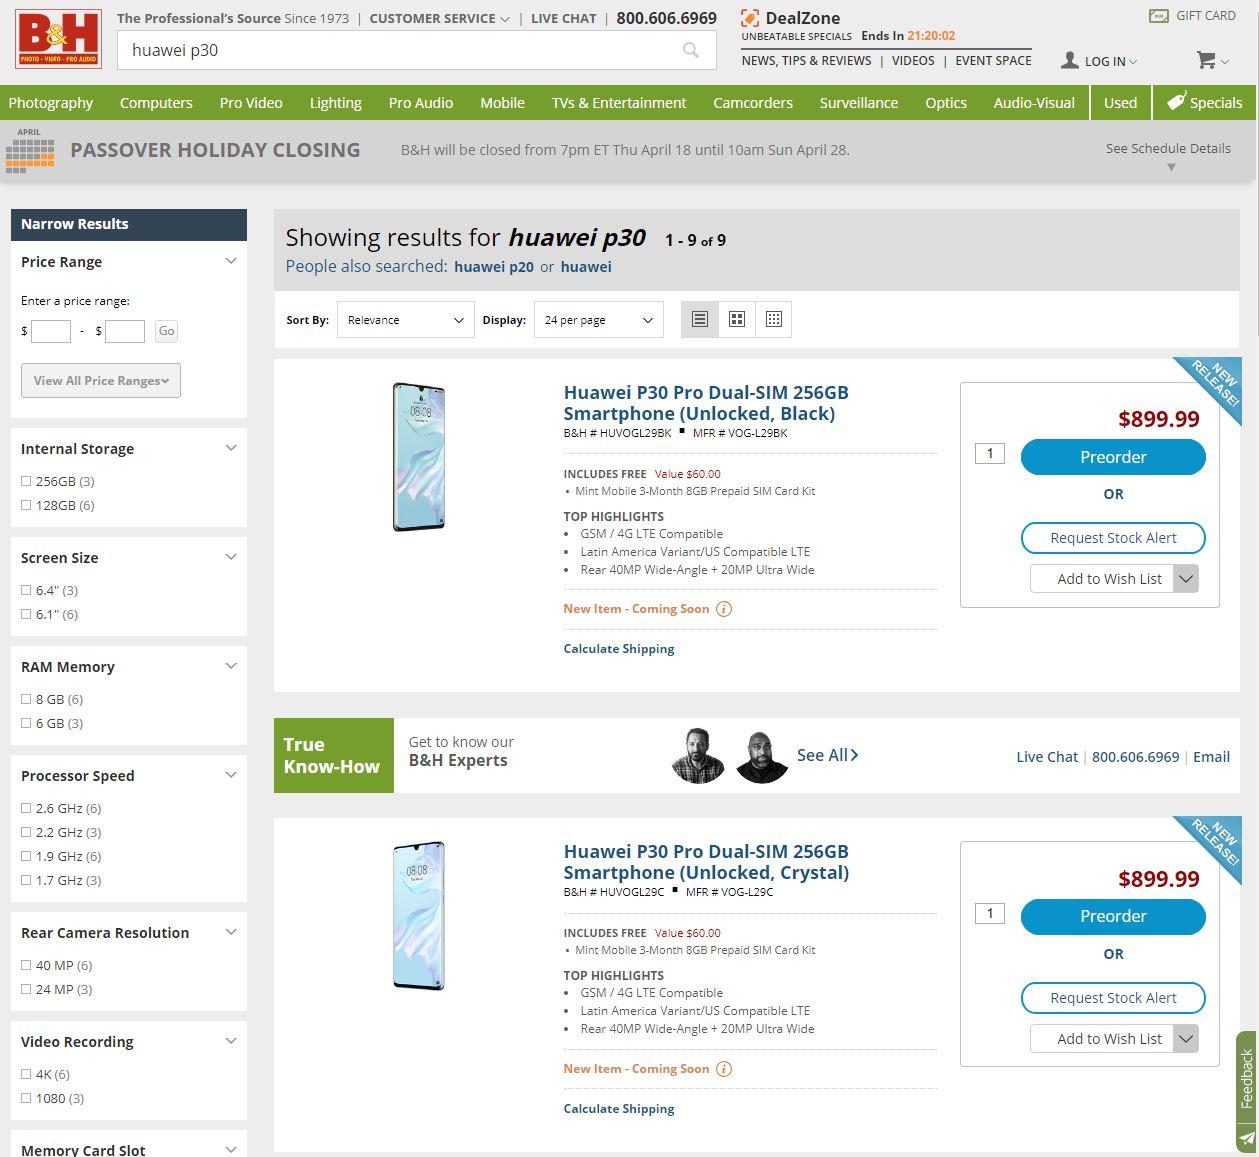 Huawei P30 PRO B&H